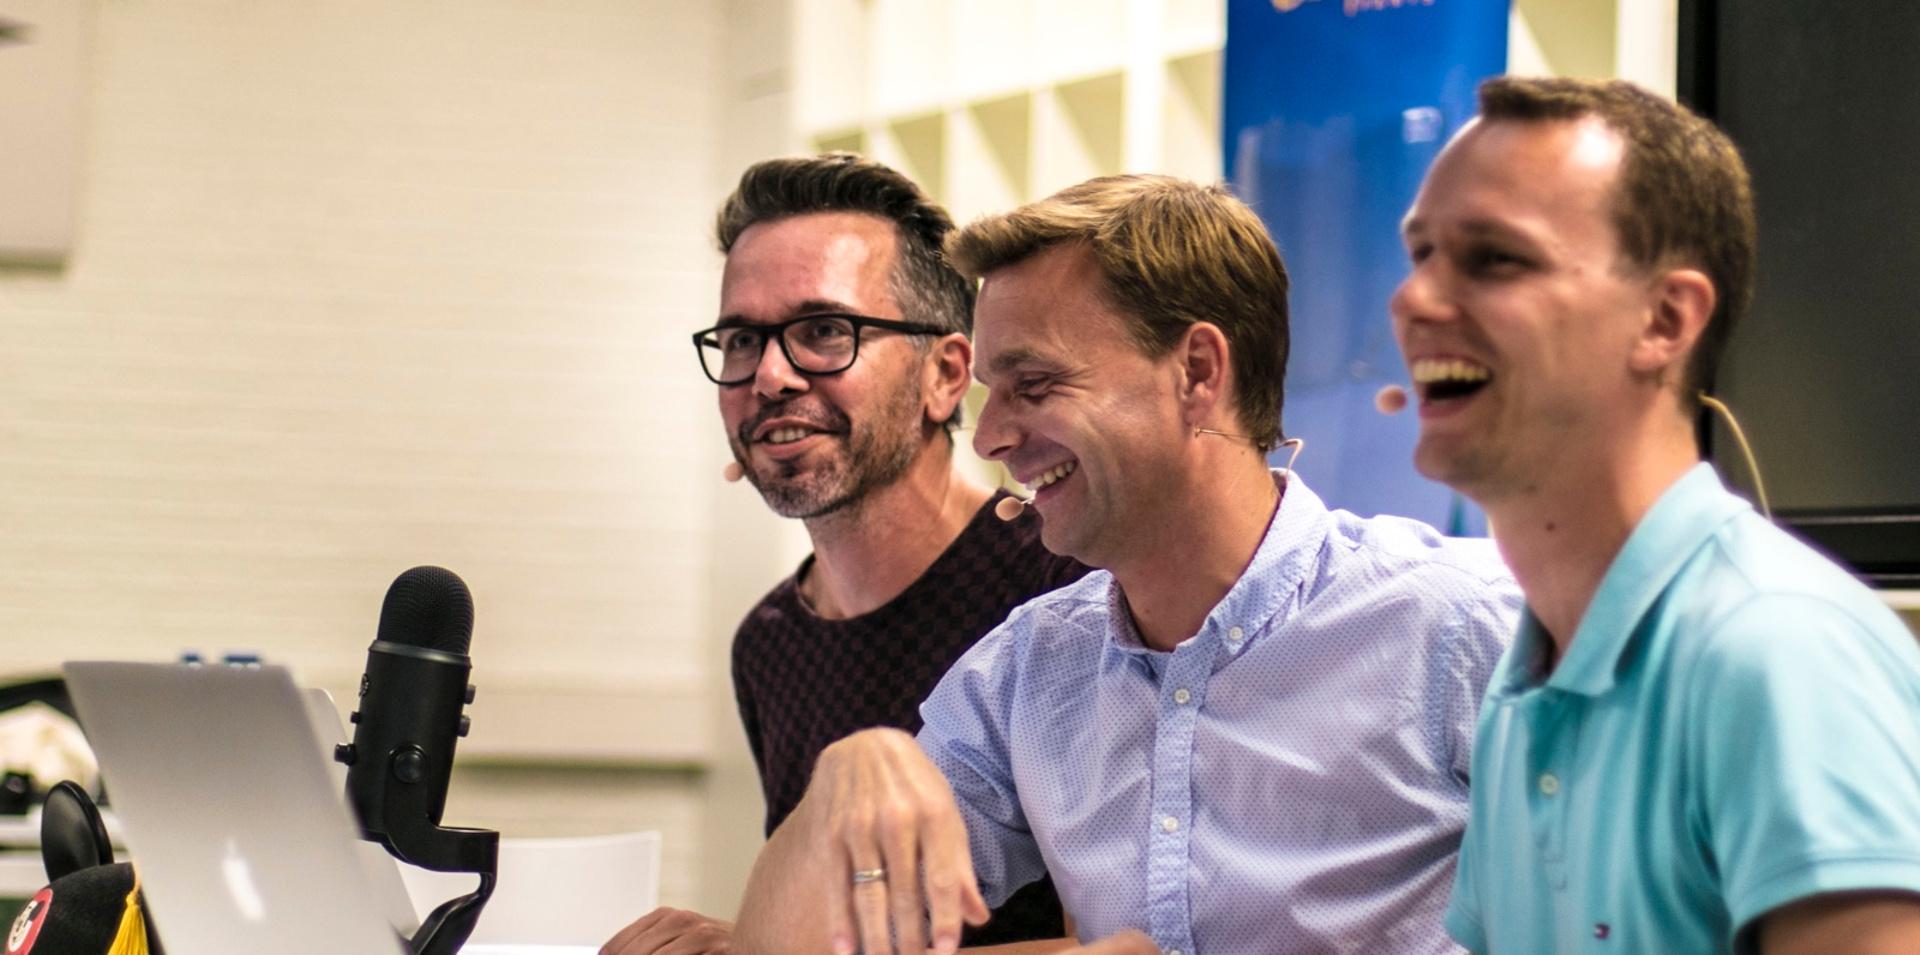 Michiel, Ralf en Jorn